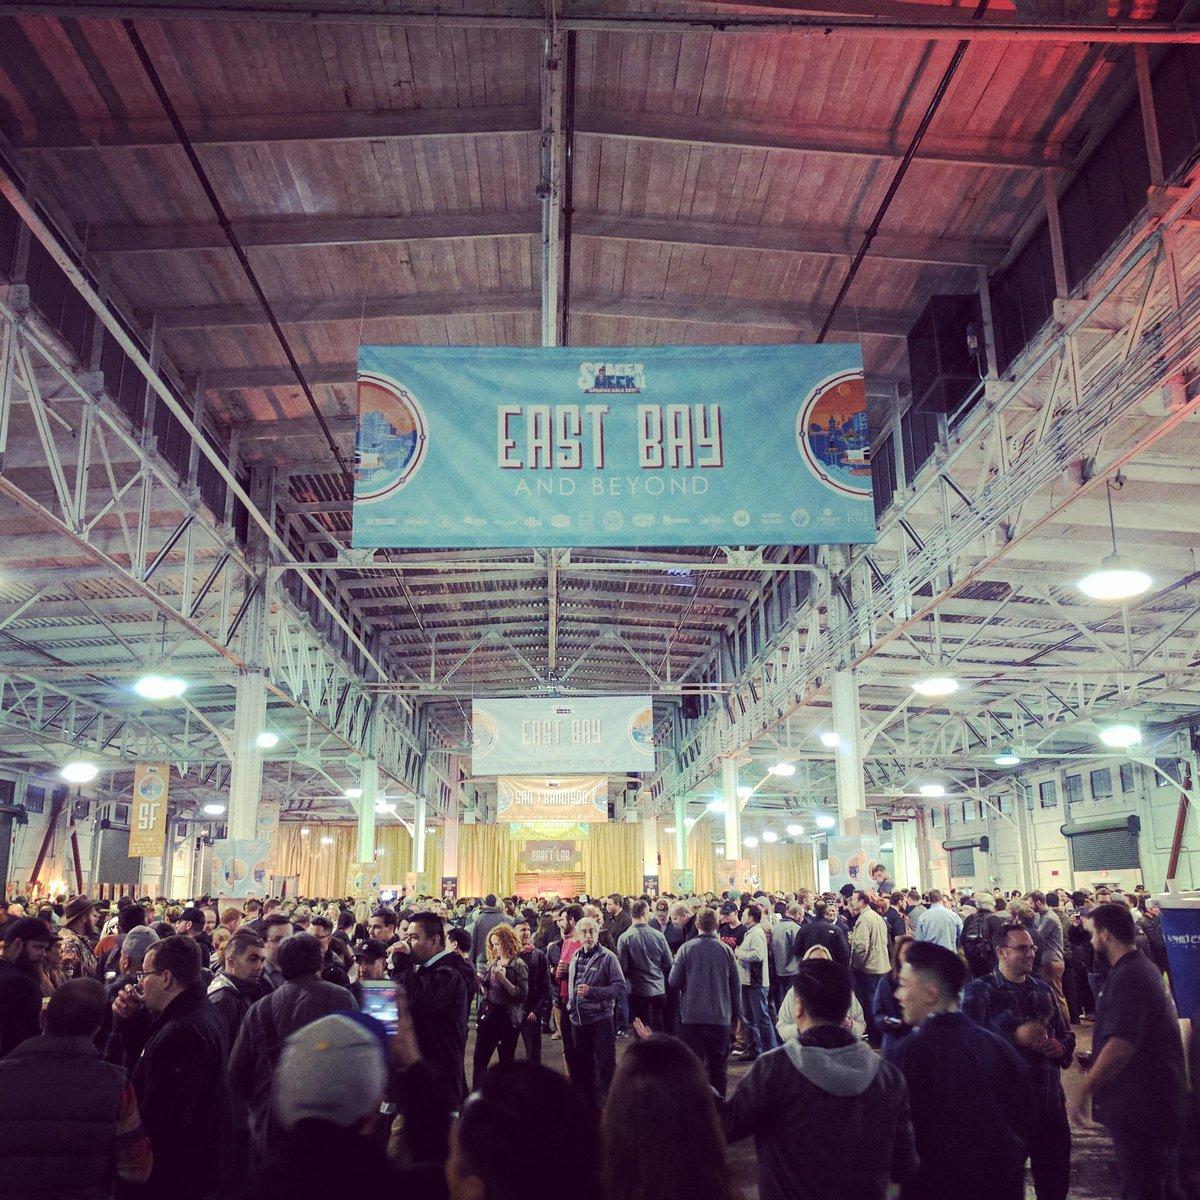 Pier 48, location of the #SFBeerWeek Opening Gala. #craftbeer https://t.co/aAyj9d9wYy